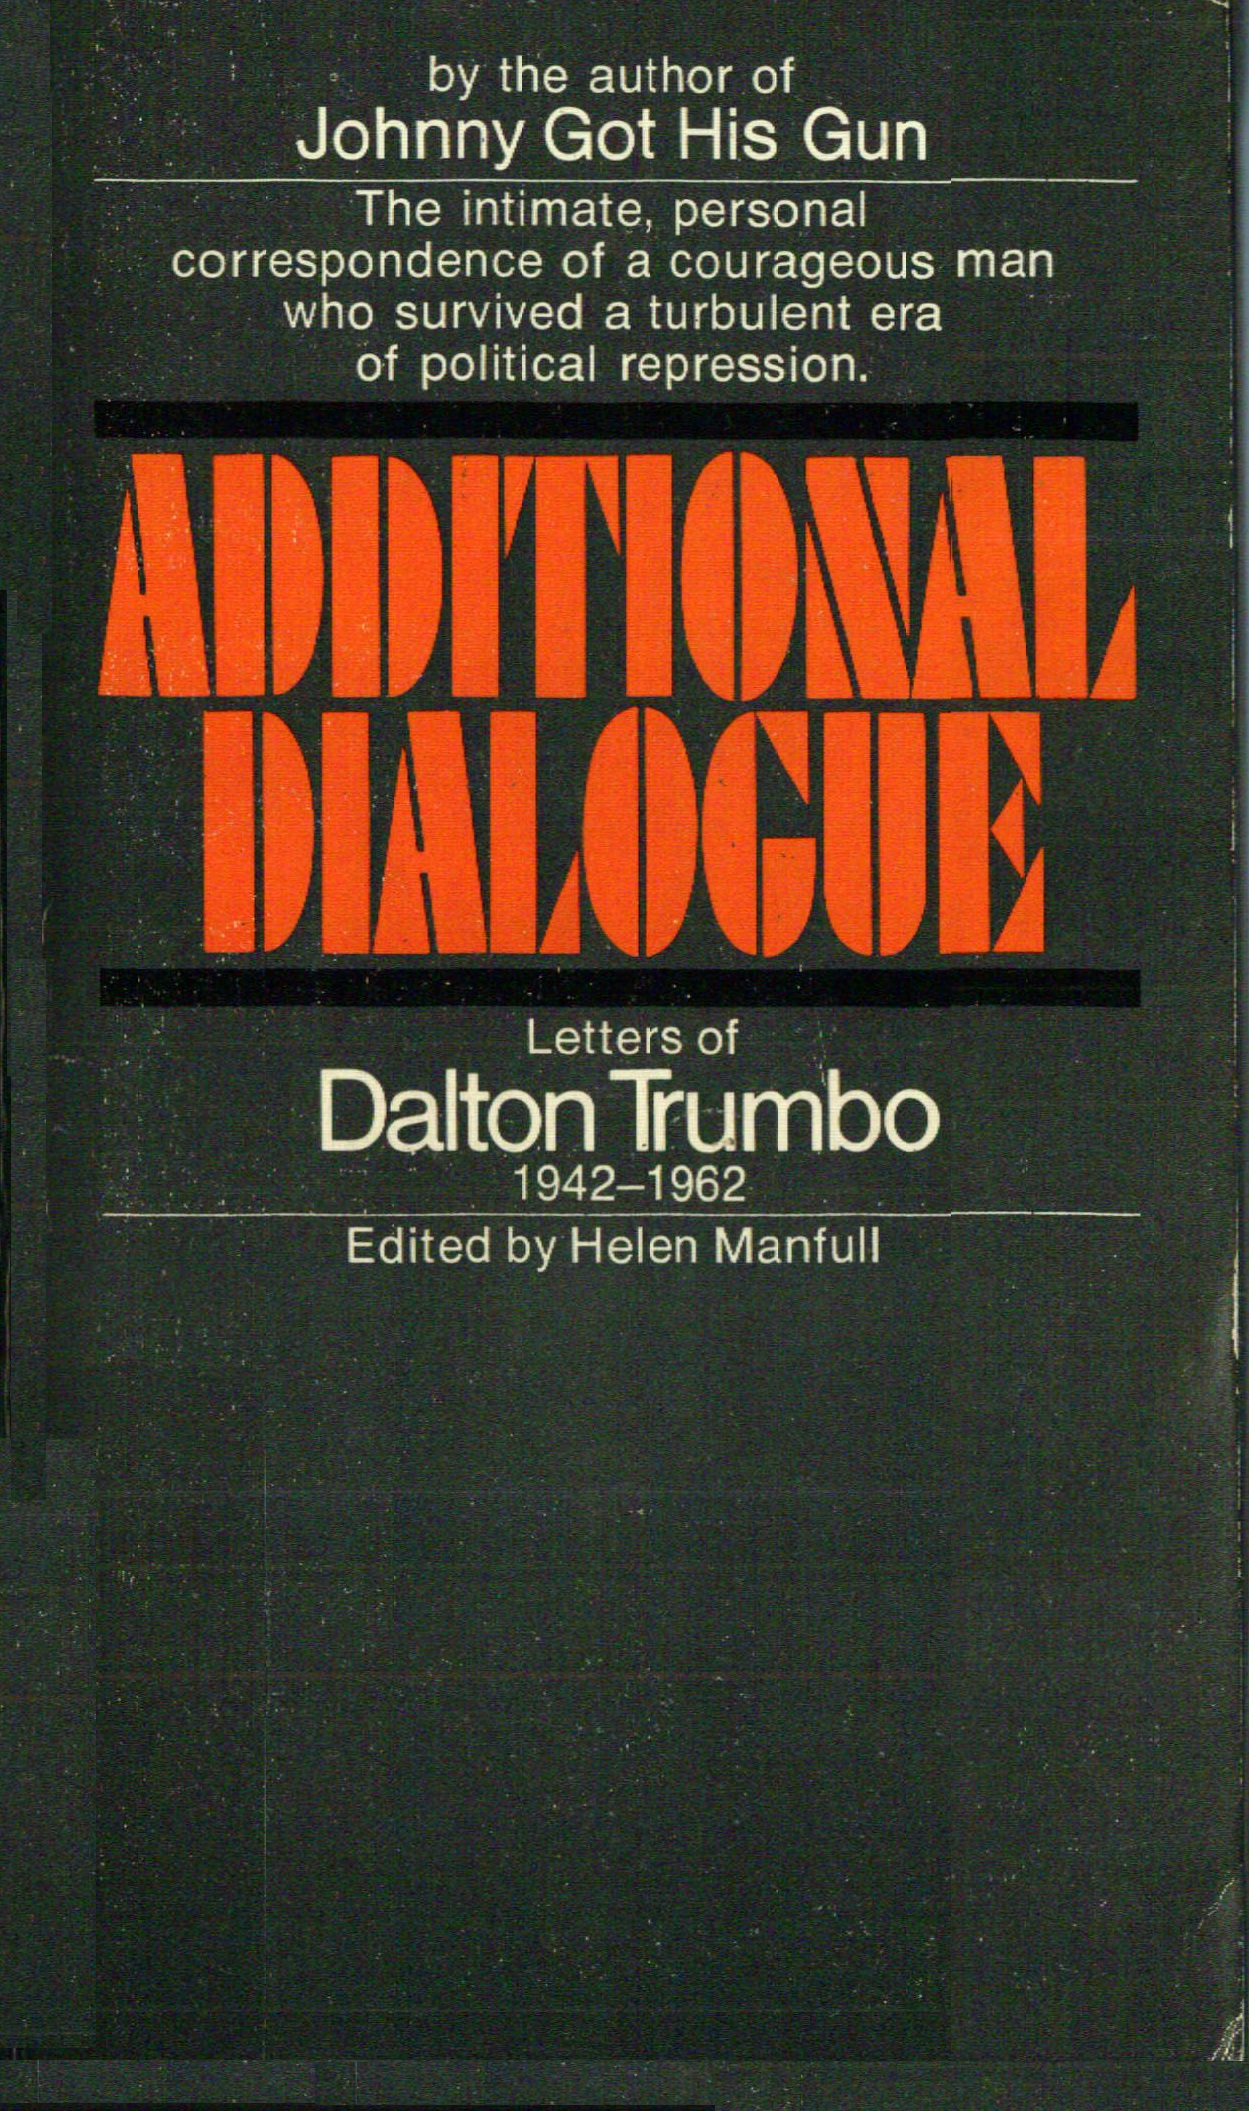 Additional Dialogue